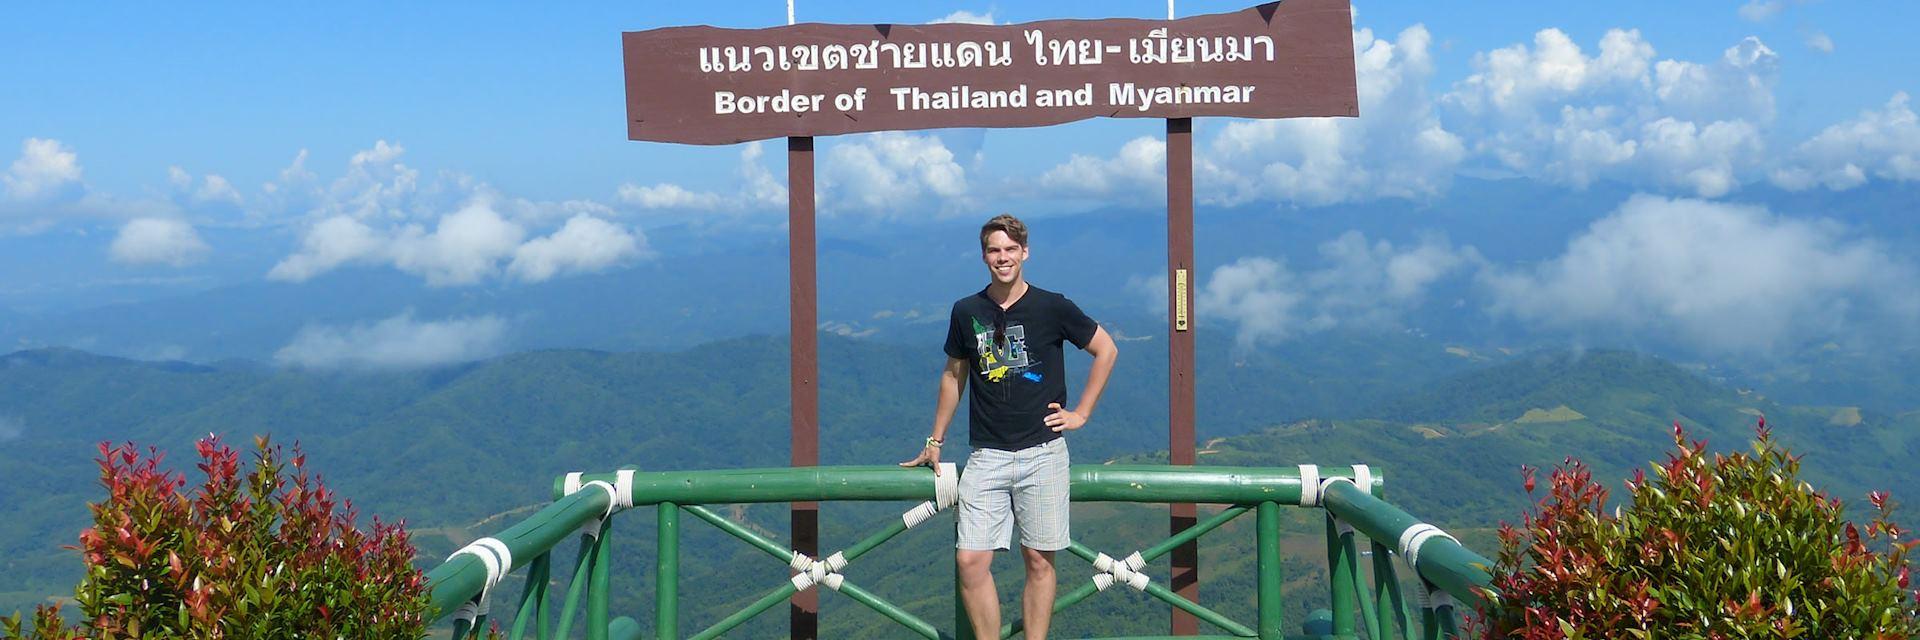 Rob on the Thai-Burma border